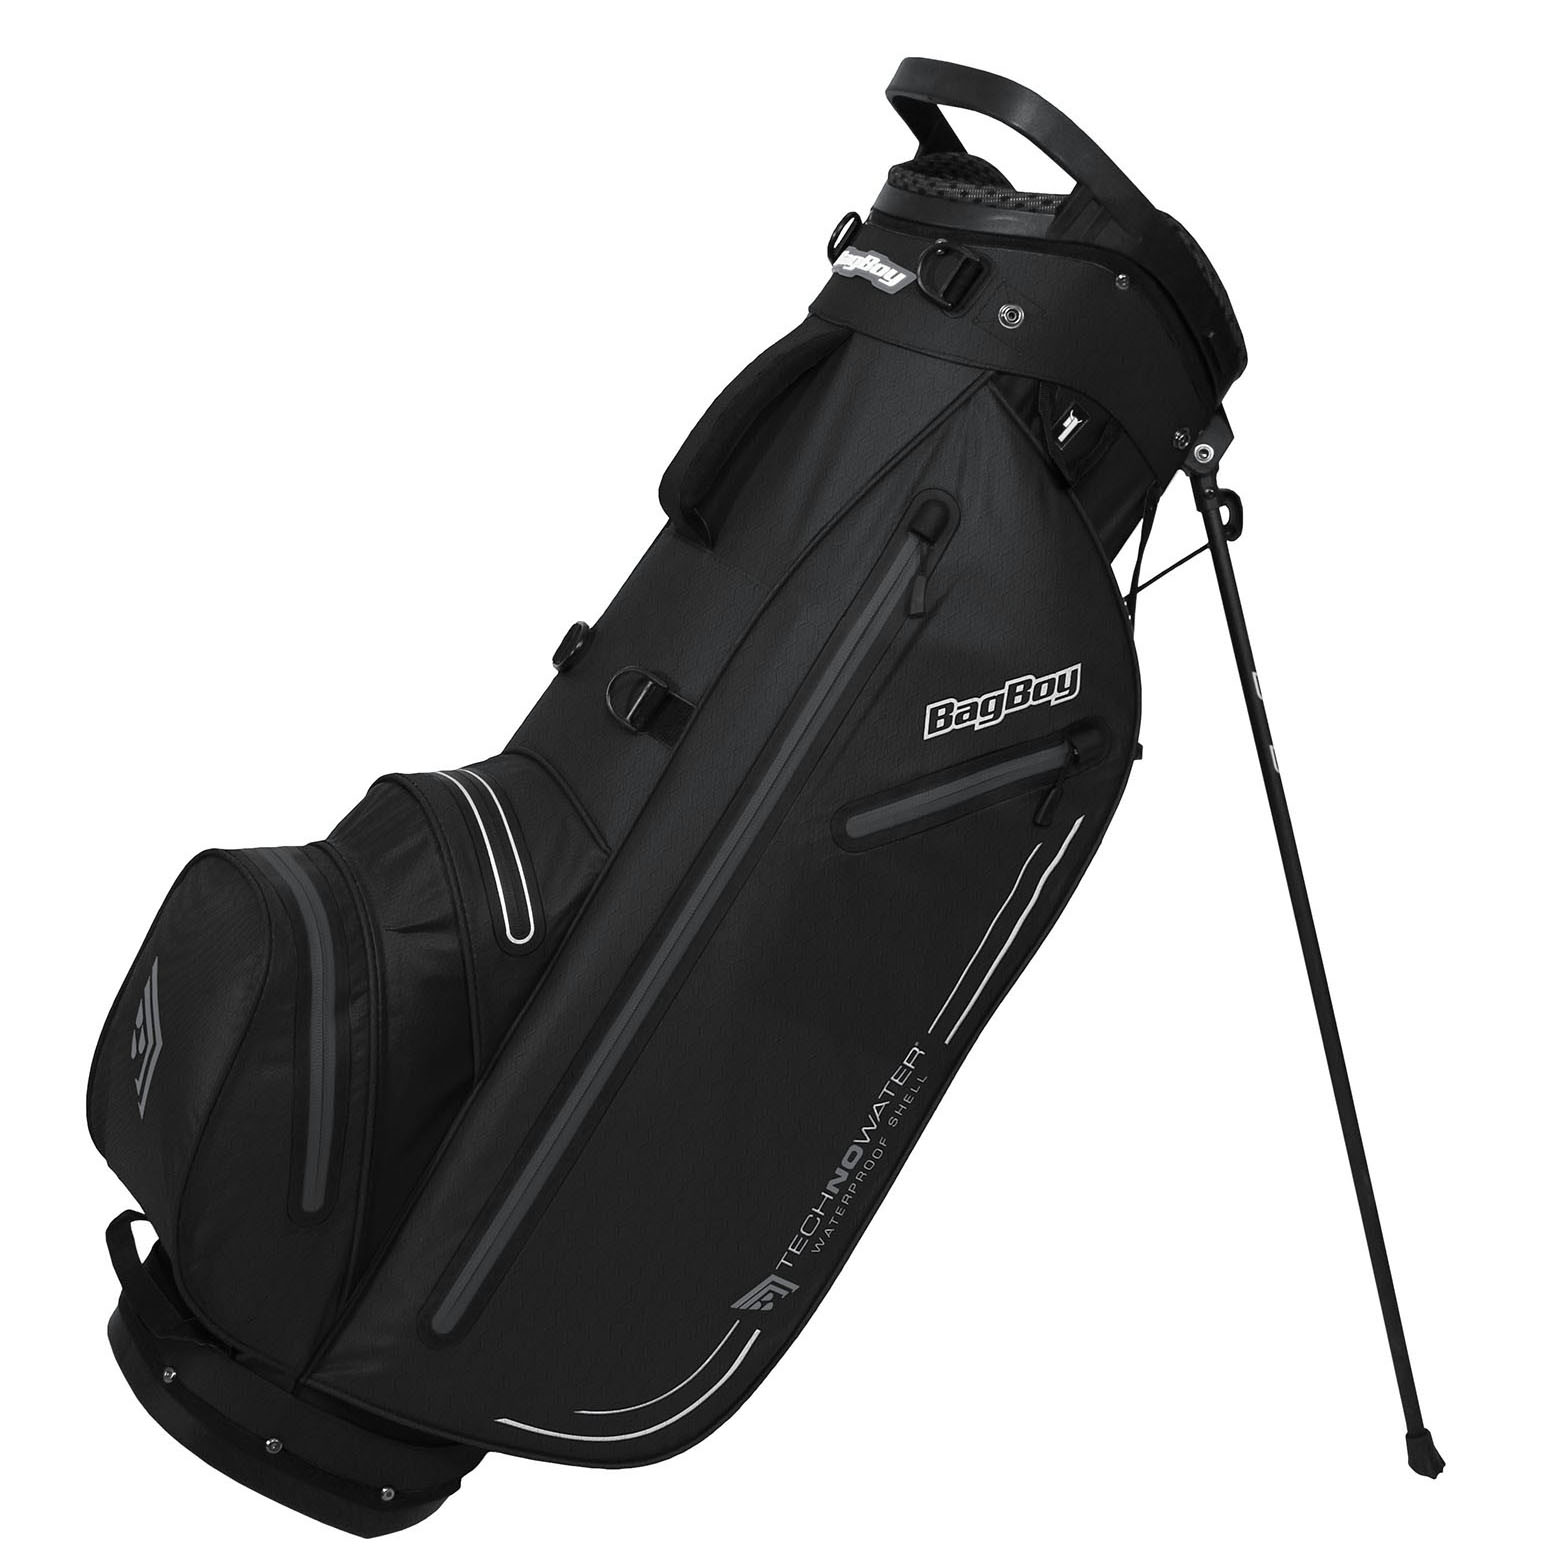 BagBoy Technowater Trekker Dri Golf Stand Bag – Black/Grey